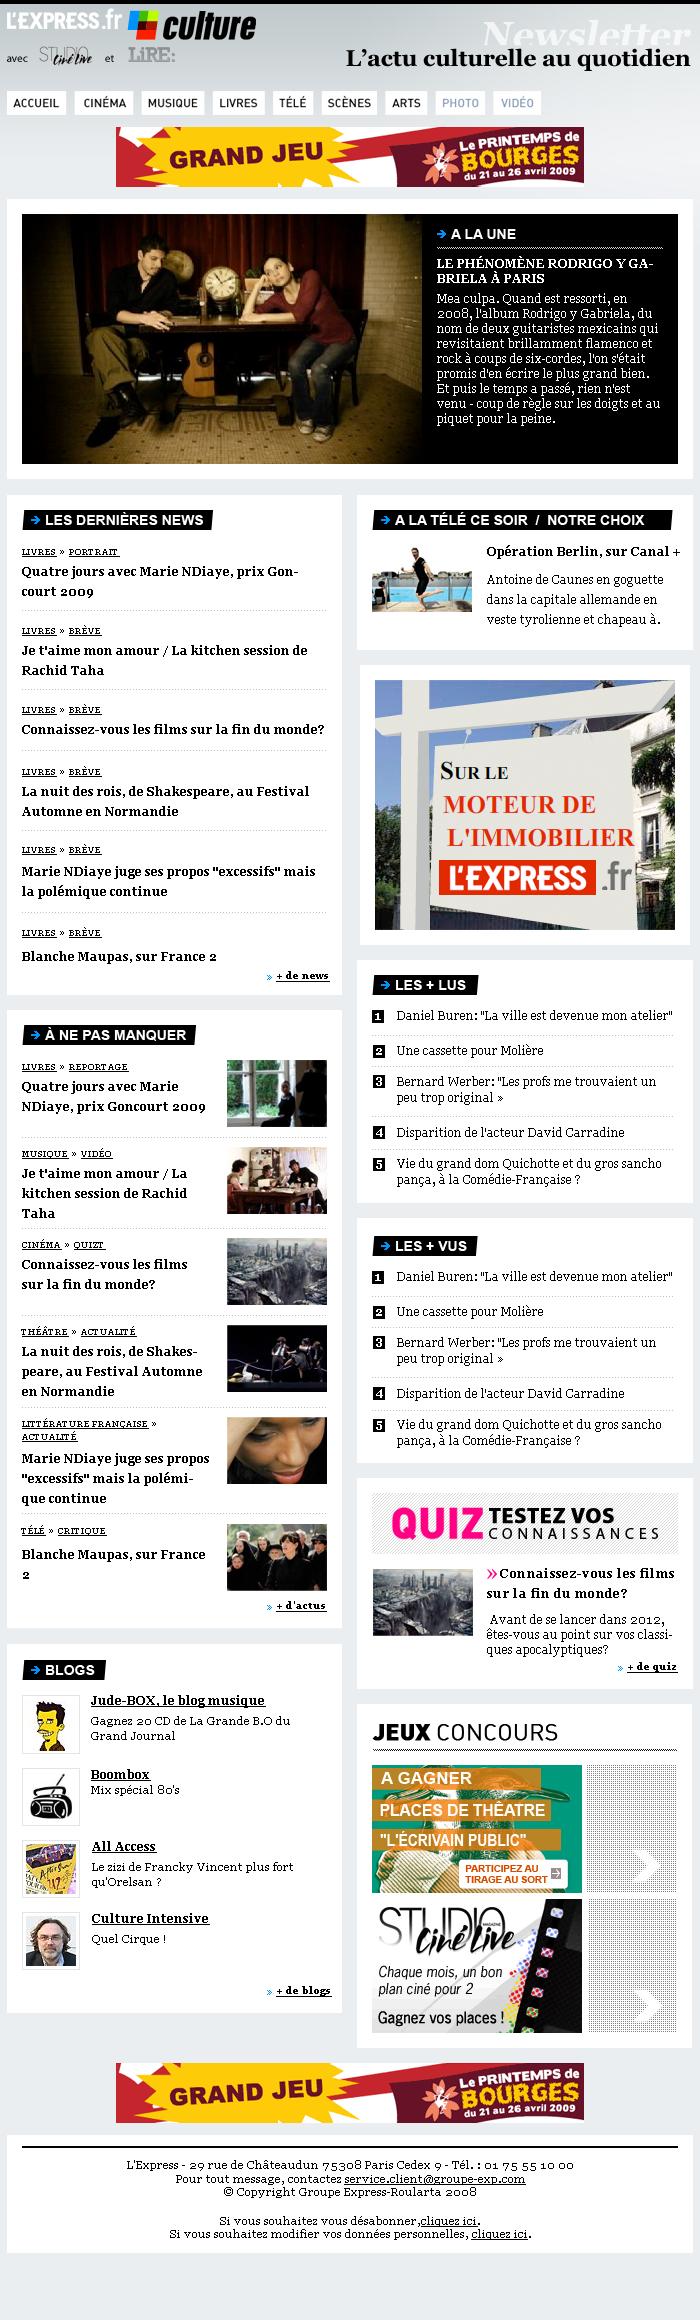 Newsletter pour lexpress Culture